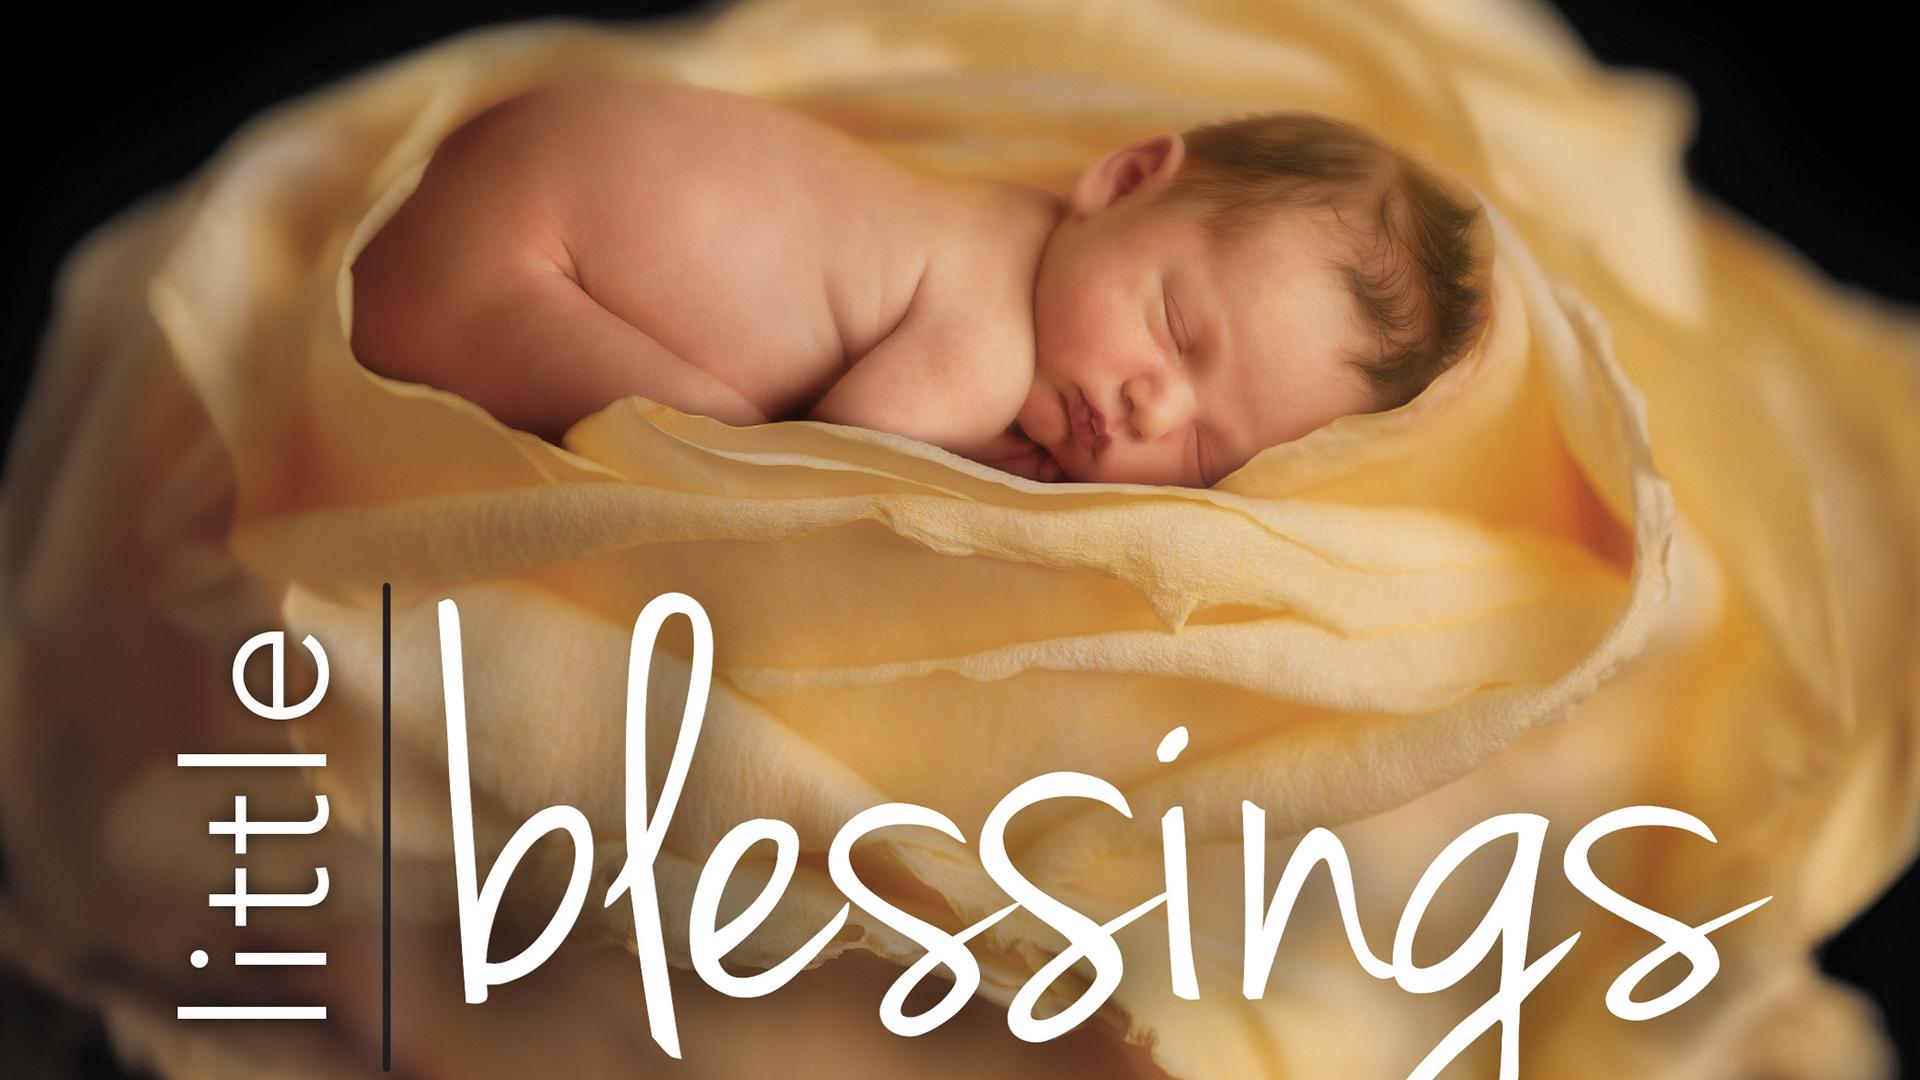 Little blessings | Sheknows.com